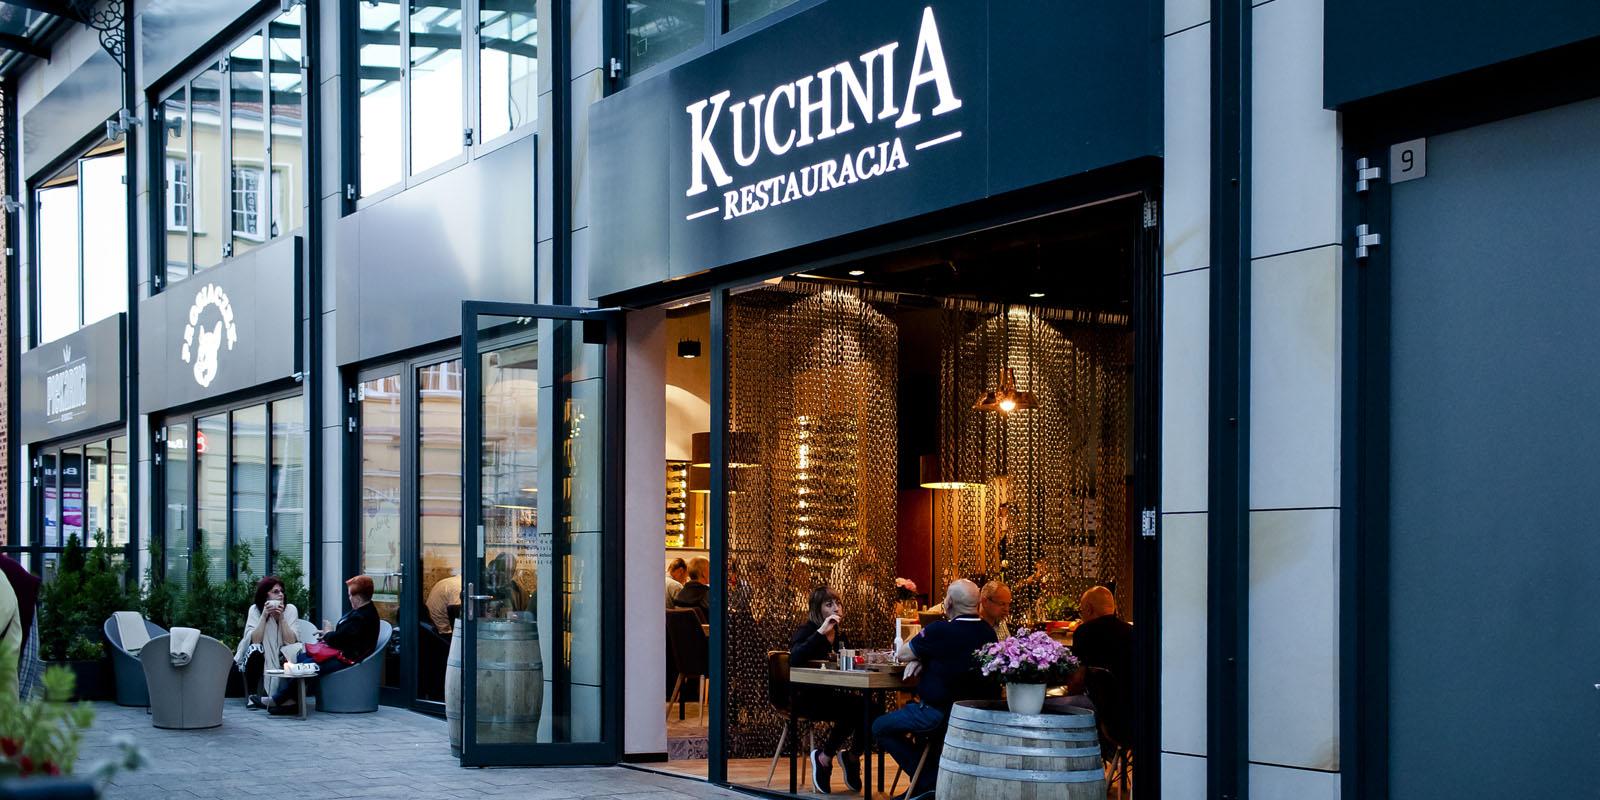 Kuchnia Restauracja